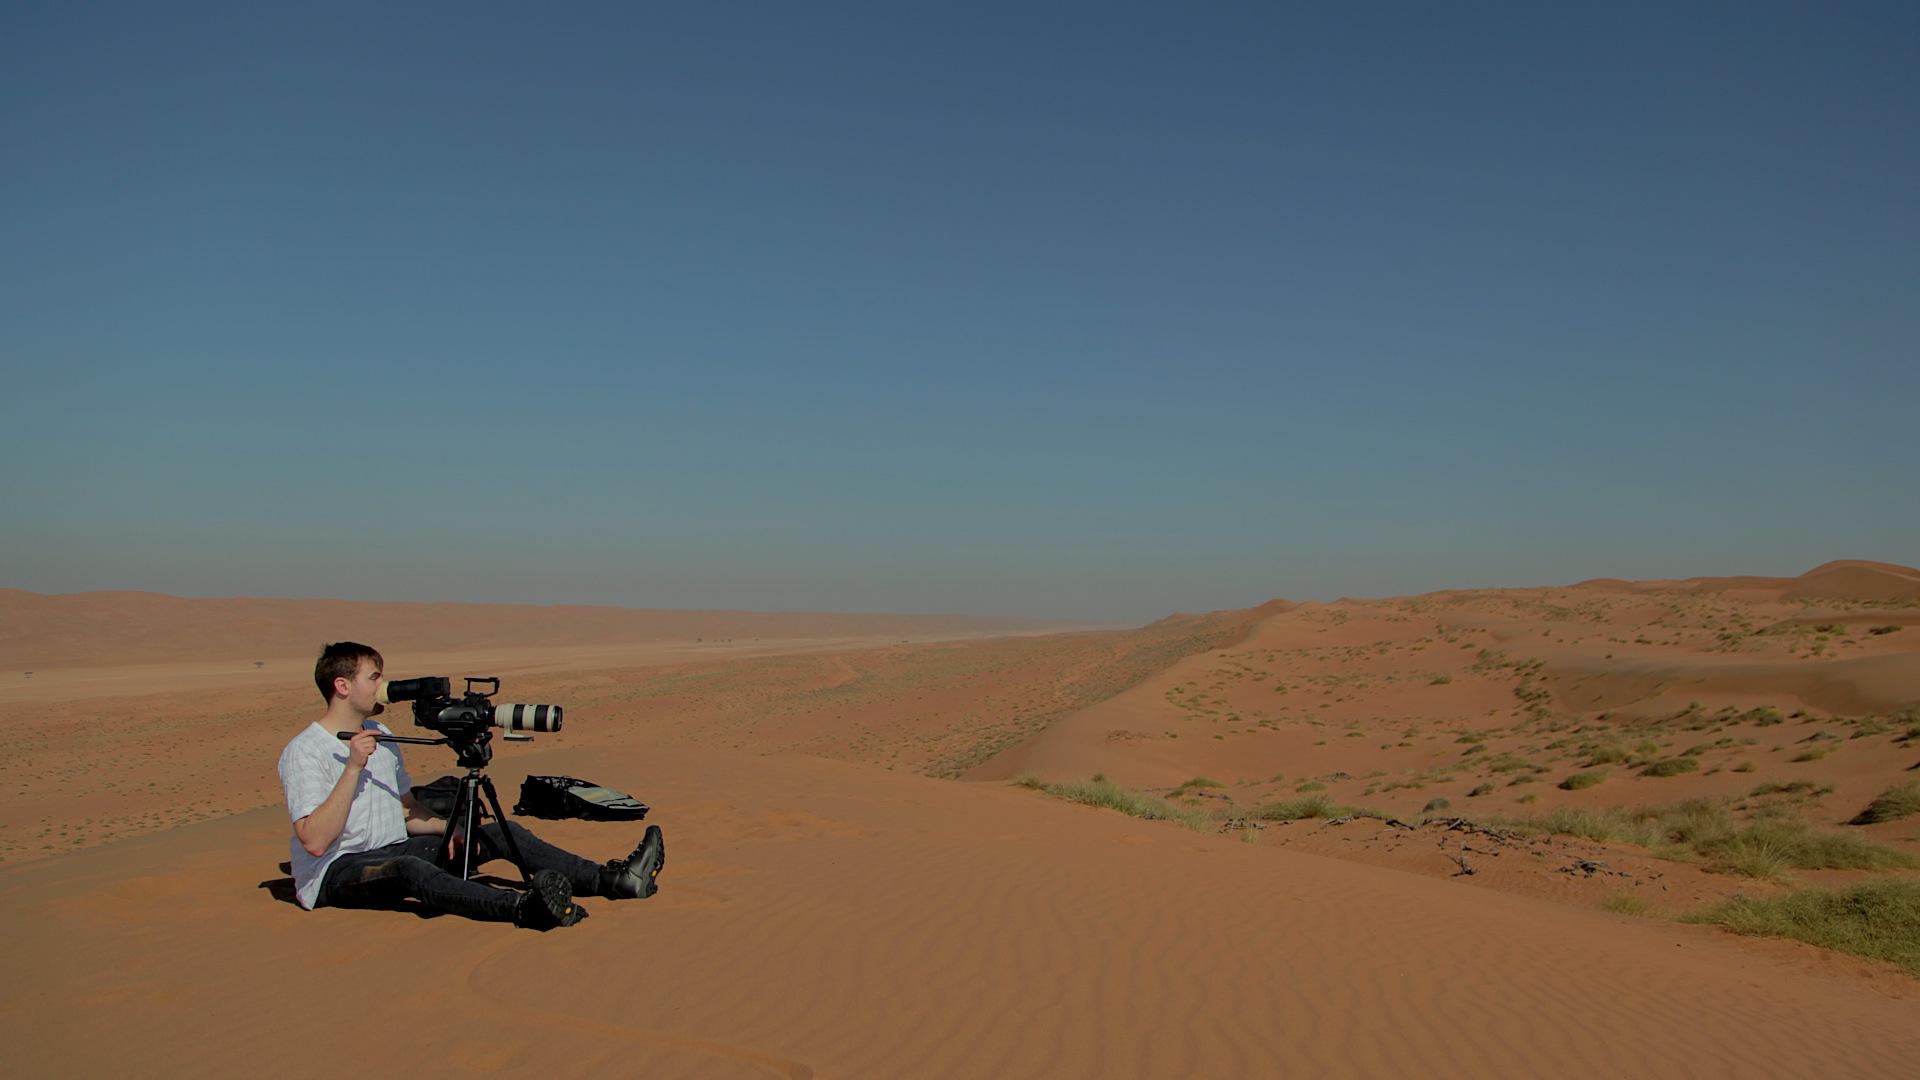 Filming Landscapes in the Omani Desert